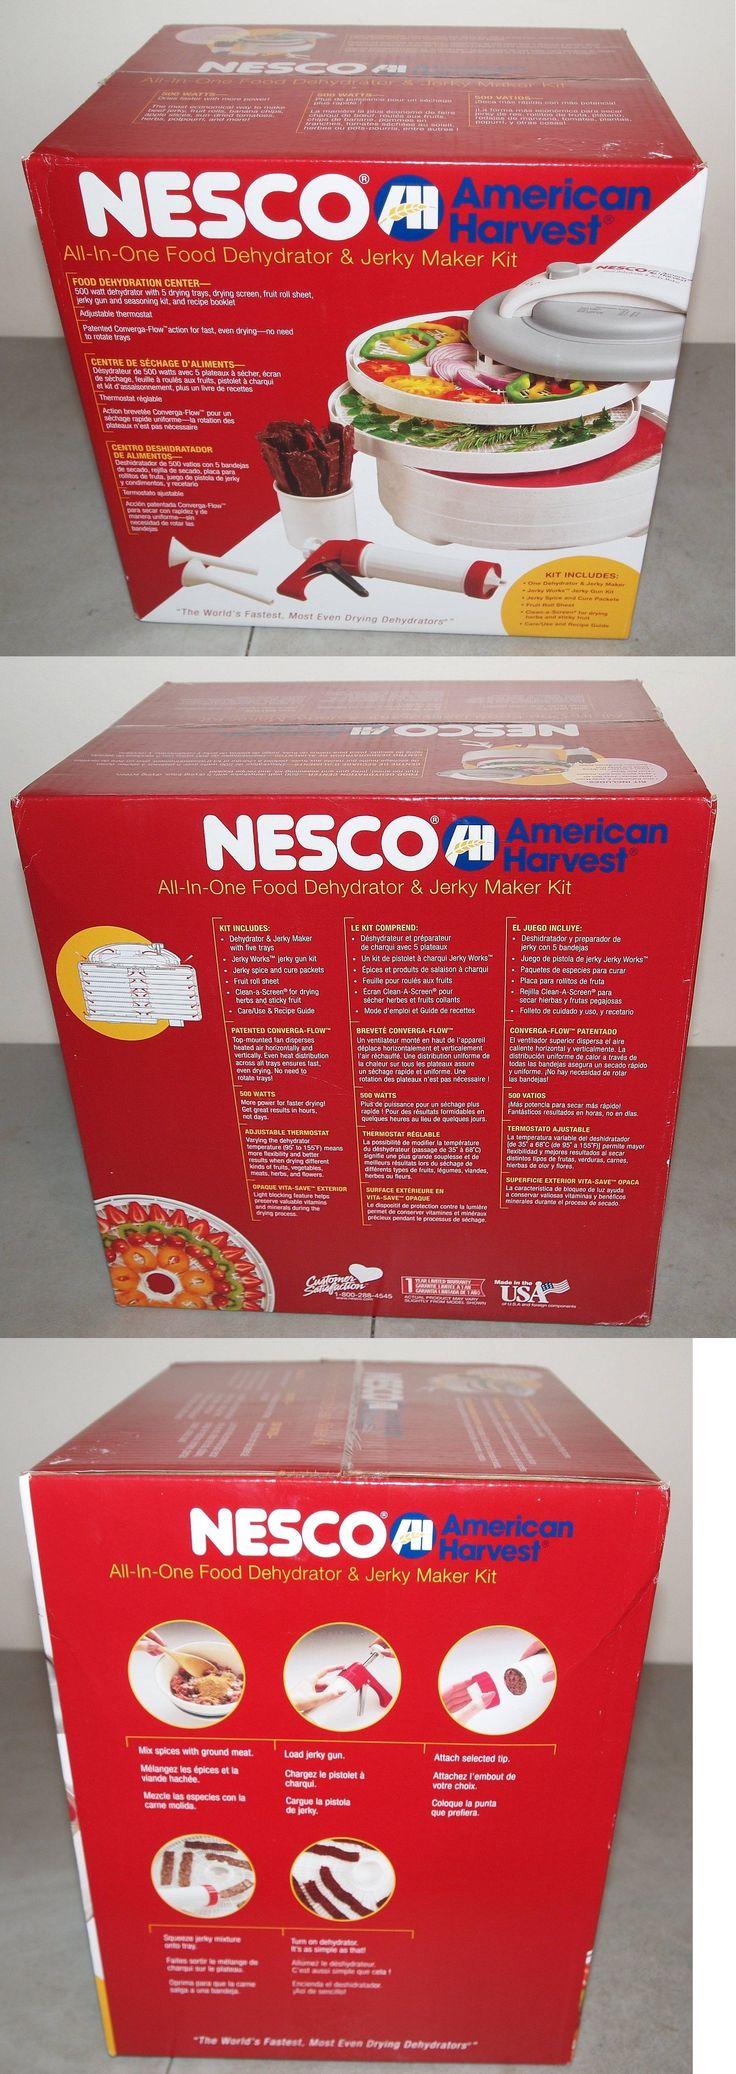 Food Dehydrators 32883: New!! Nesco (#Fd-61Whc) Food Dehydrator All-In-One Kit With Jerky Maker -> BUY IT NOW ONLY: $49.99 on eBay!